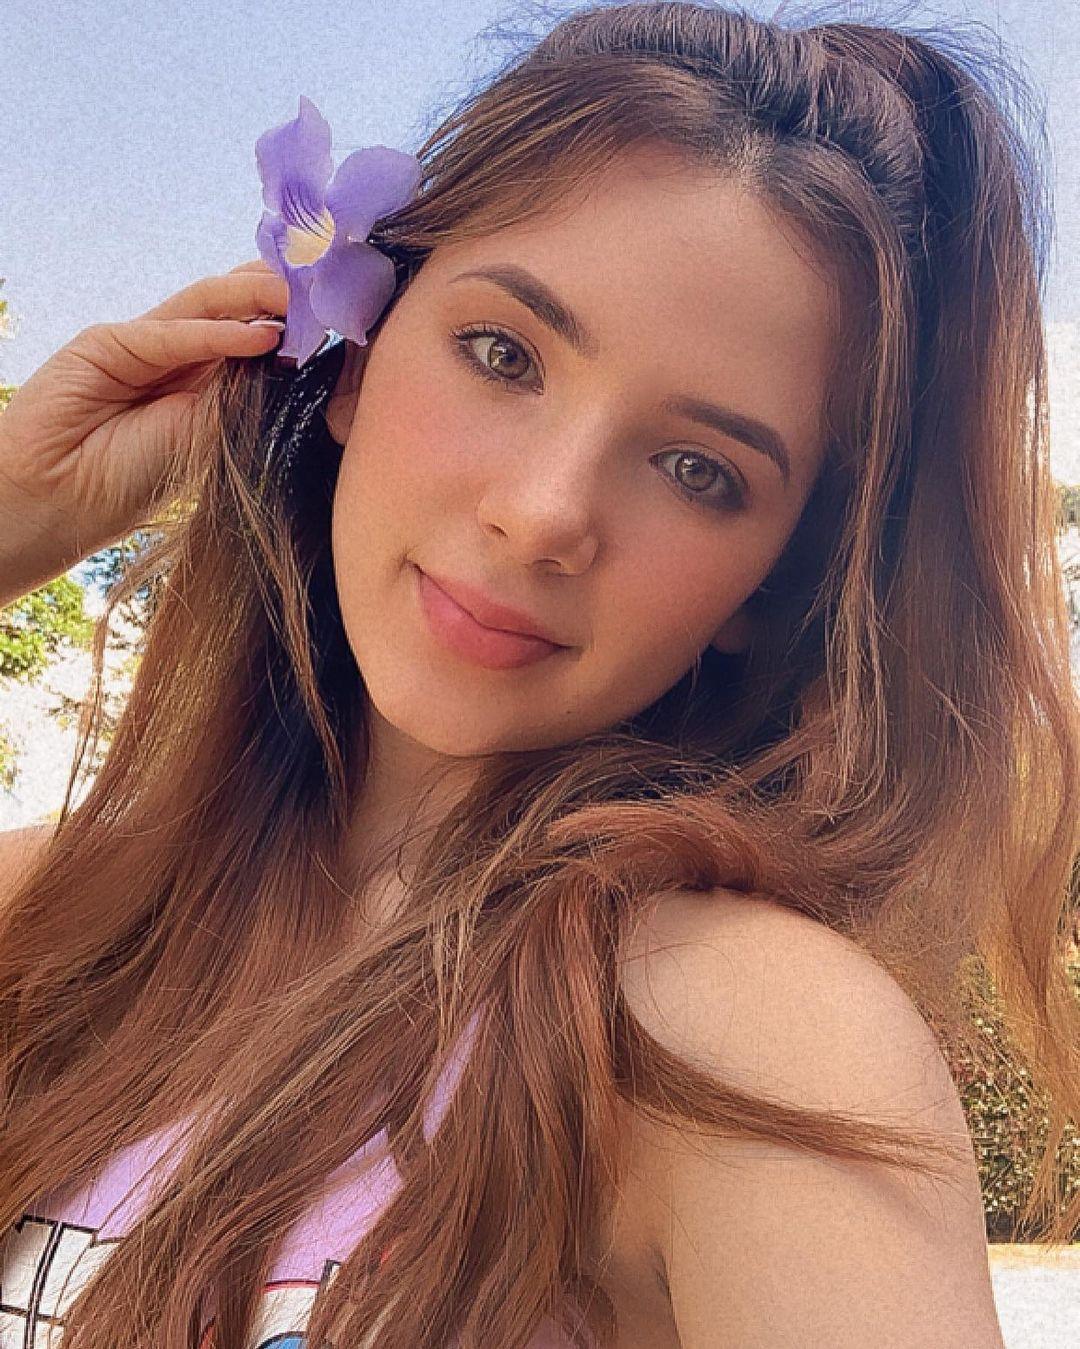 Anabel-Ramirez-Wallpapers-Insta-Fit-Bio-5